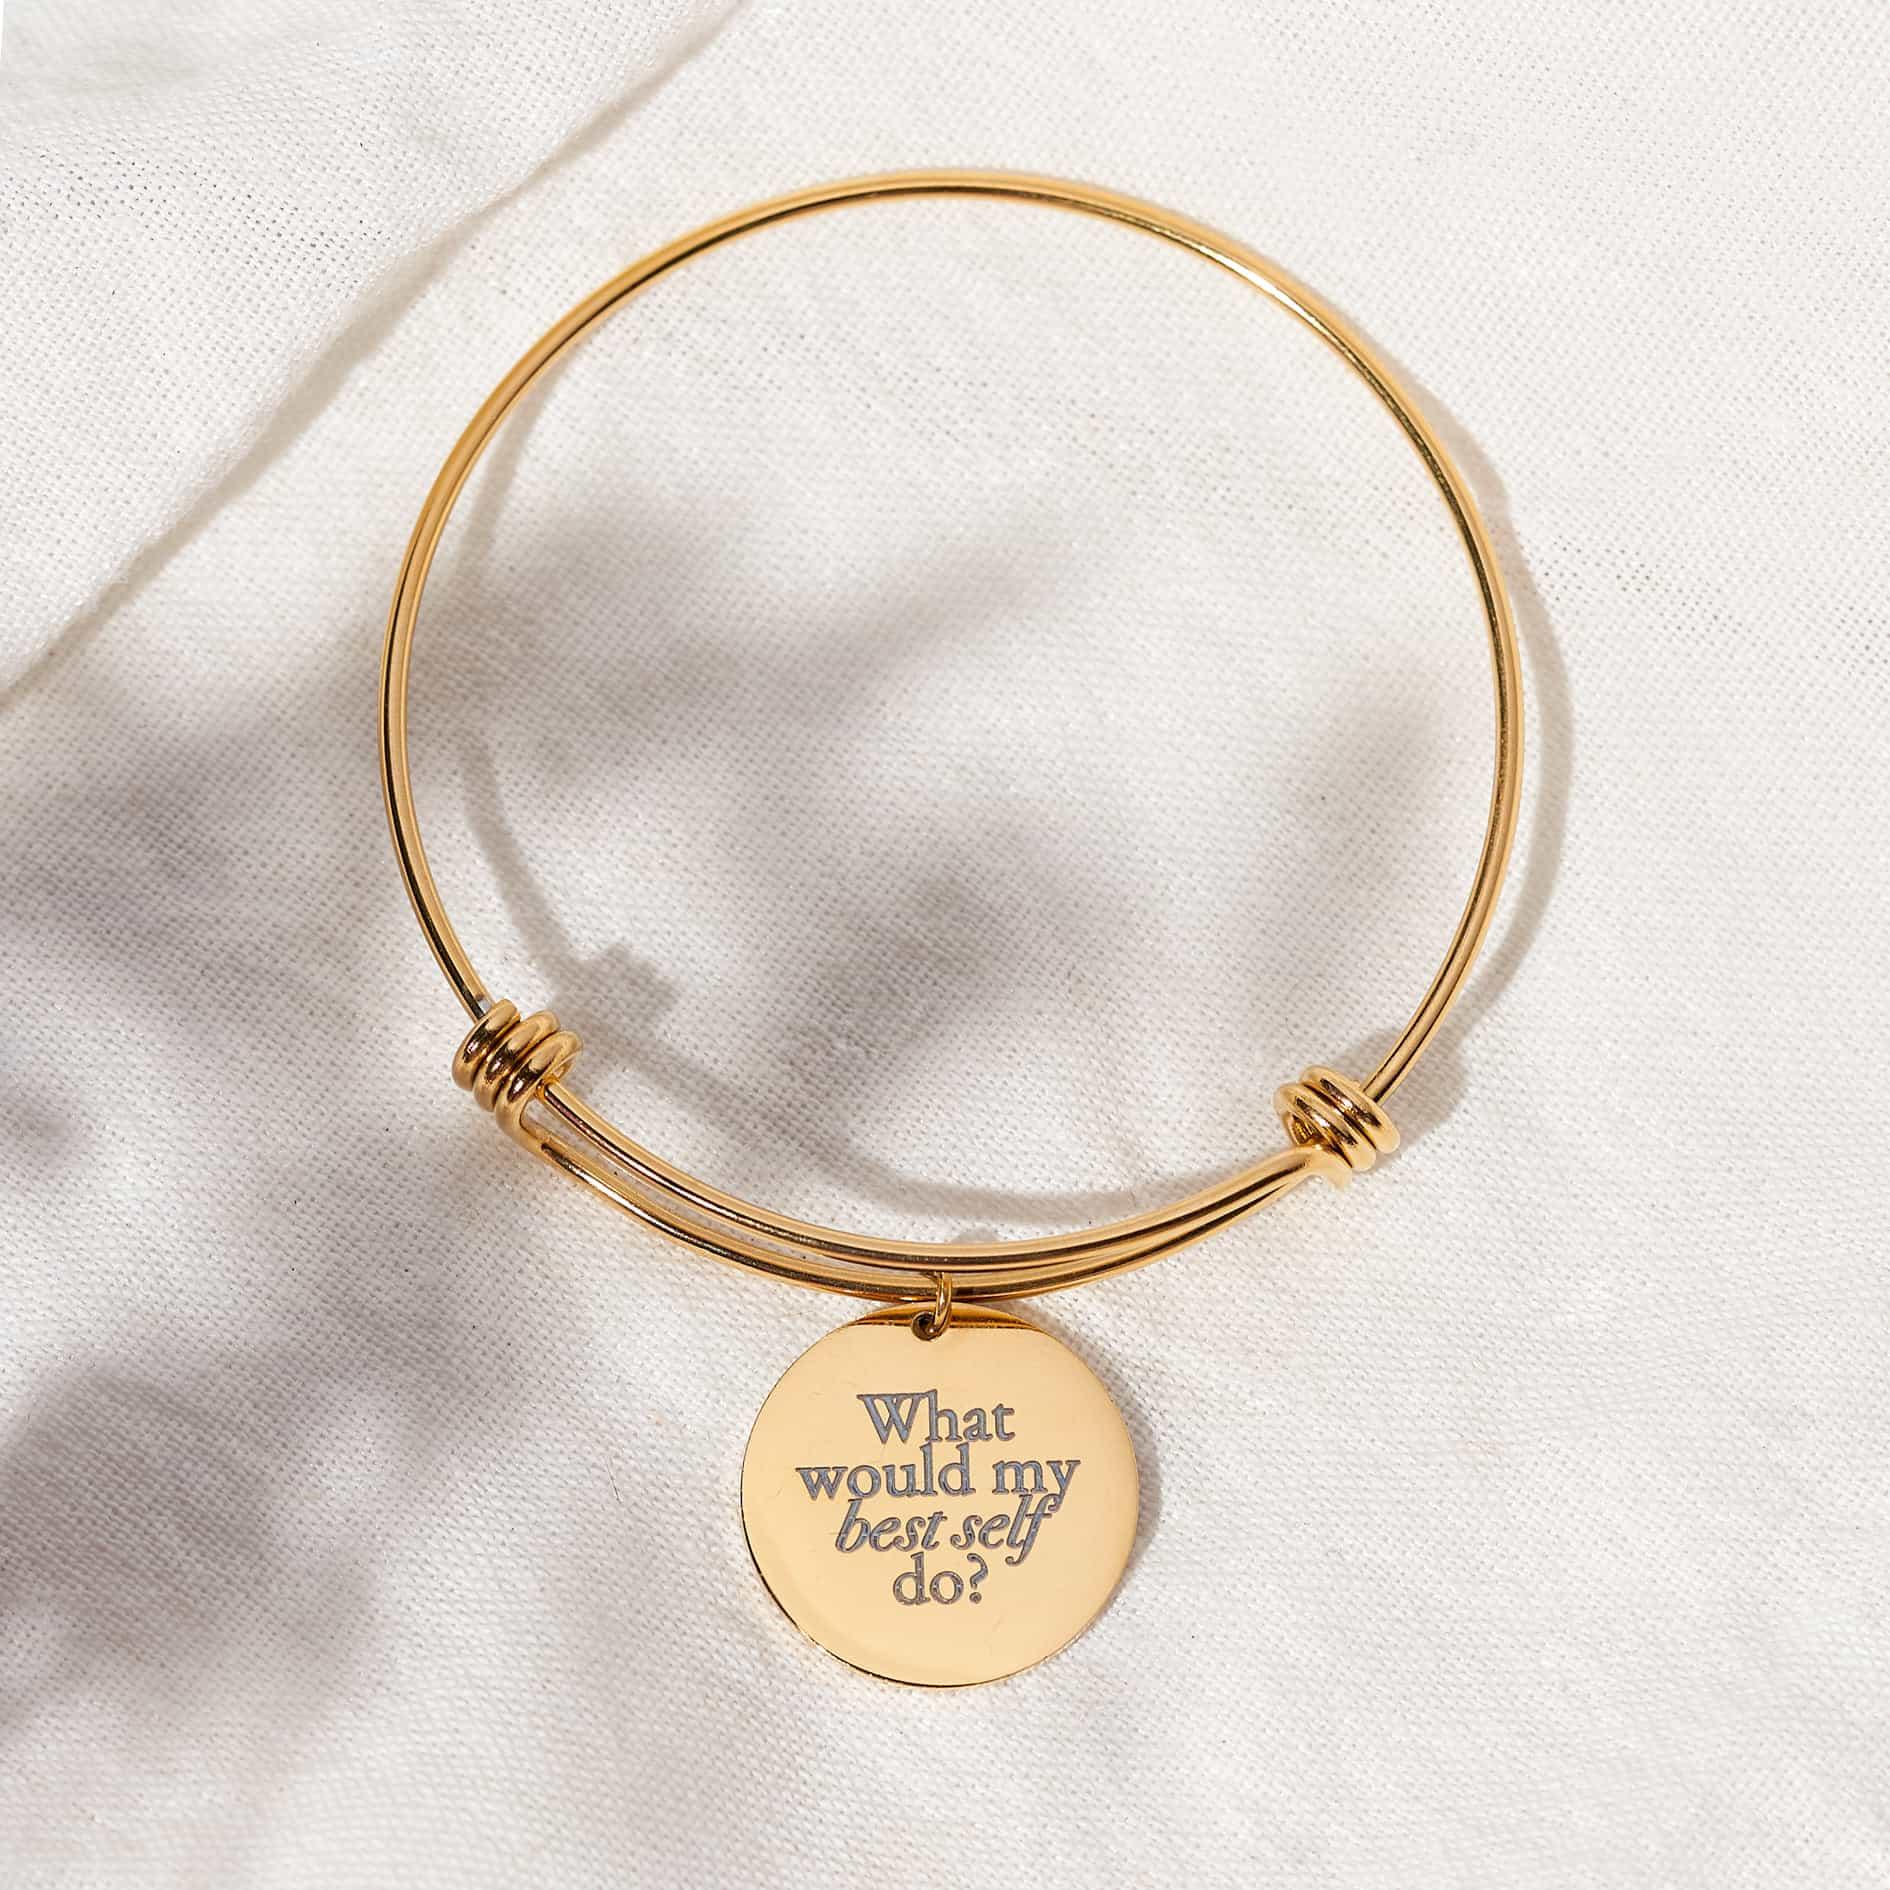 Ayn Bernos x Talaala PH jewelry collection: bracelet